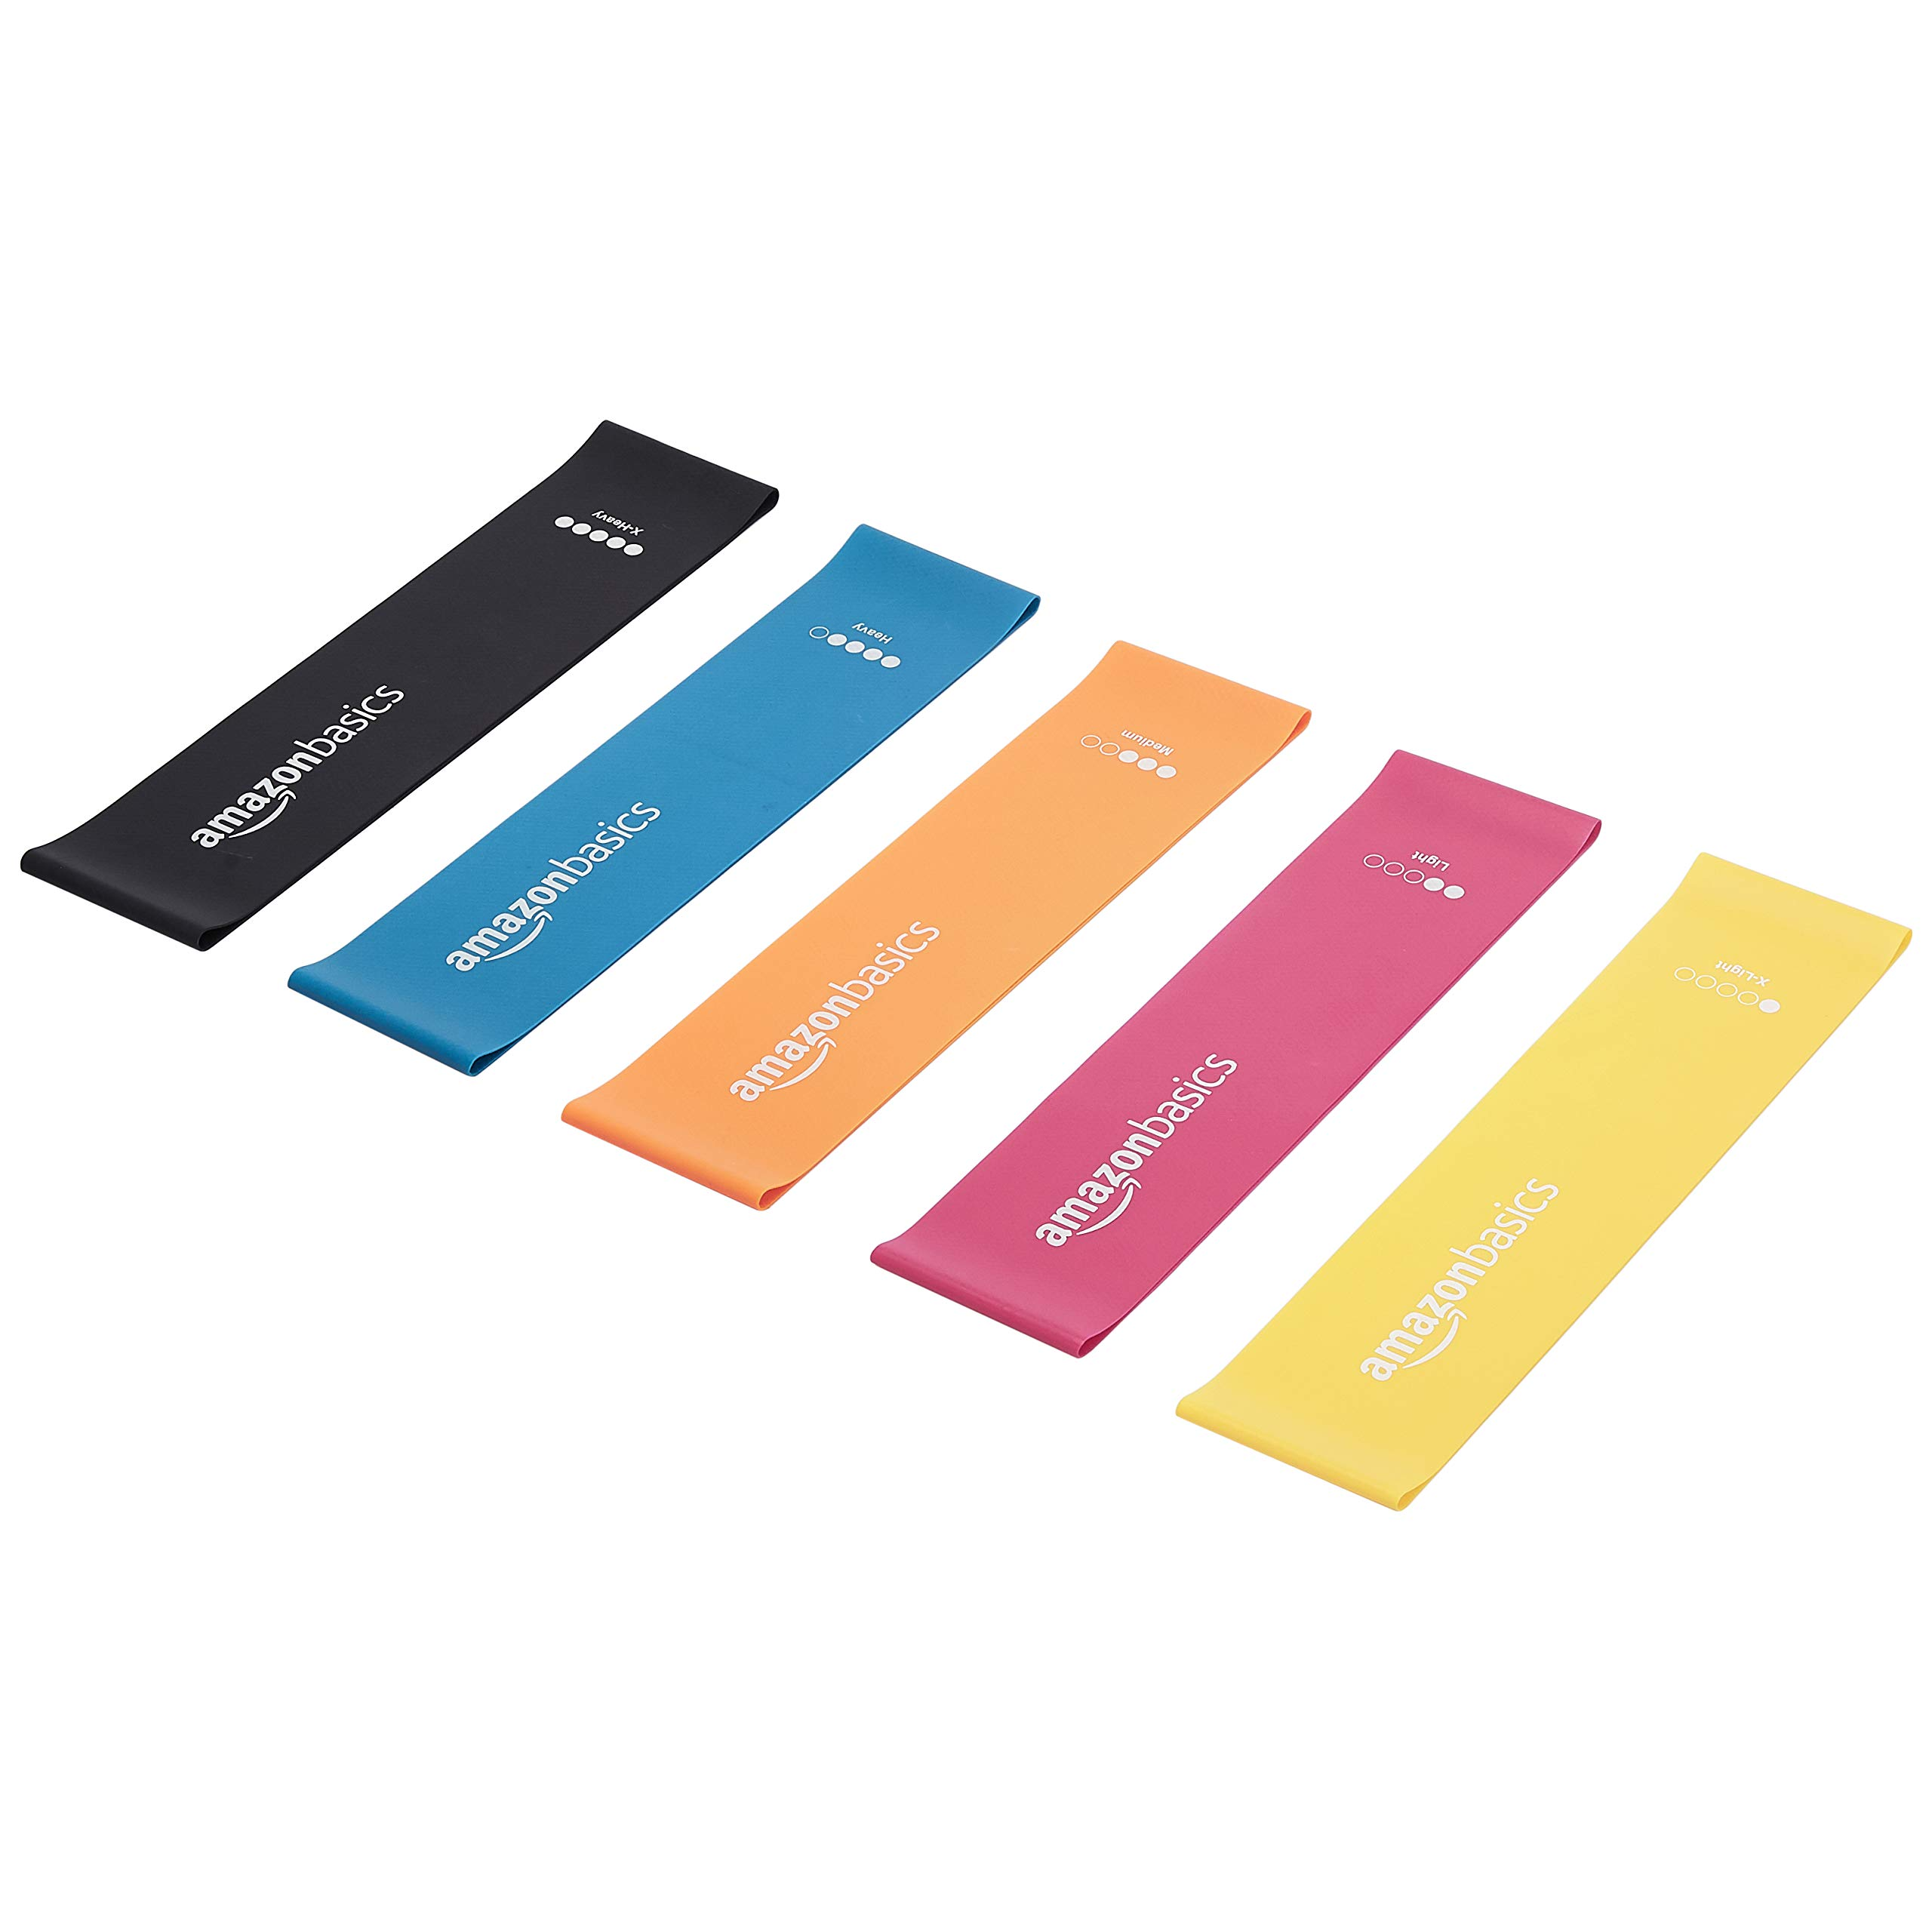 Amazon Basics Latex Resistance Band - 600mm, 5-Piece Set